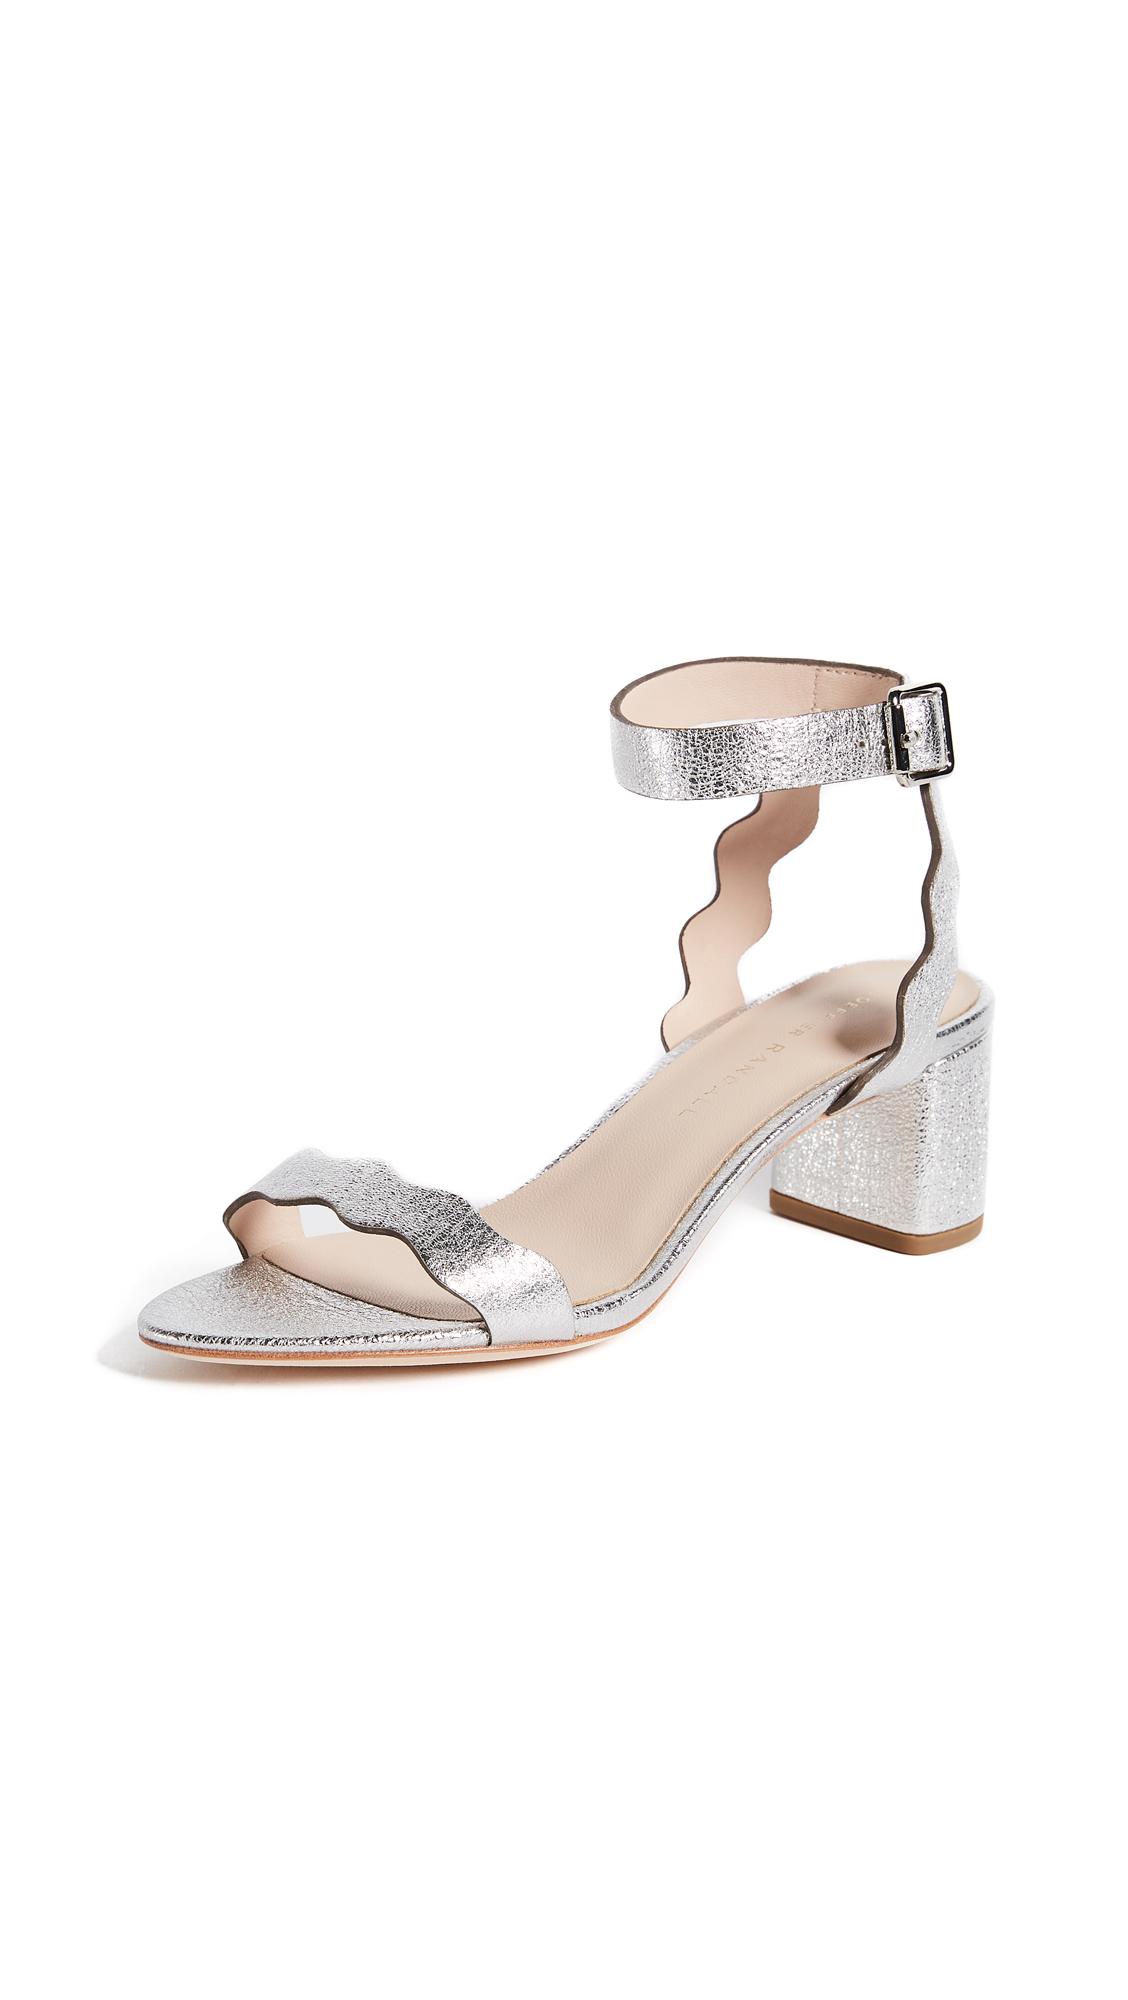 Loeffler Randall Emi City Sandals - Silver